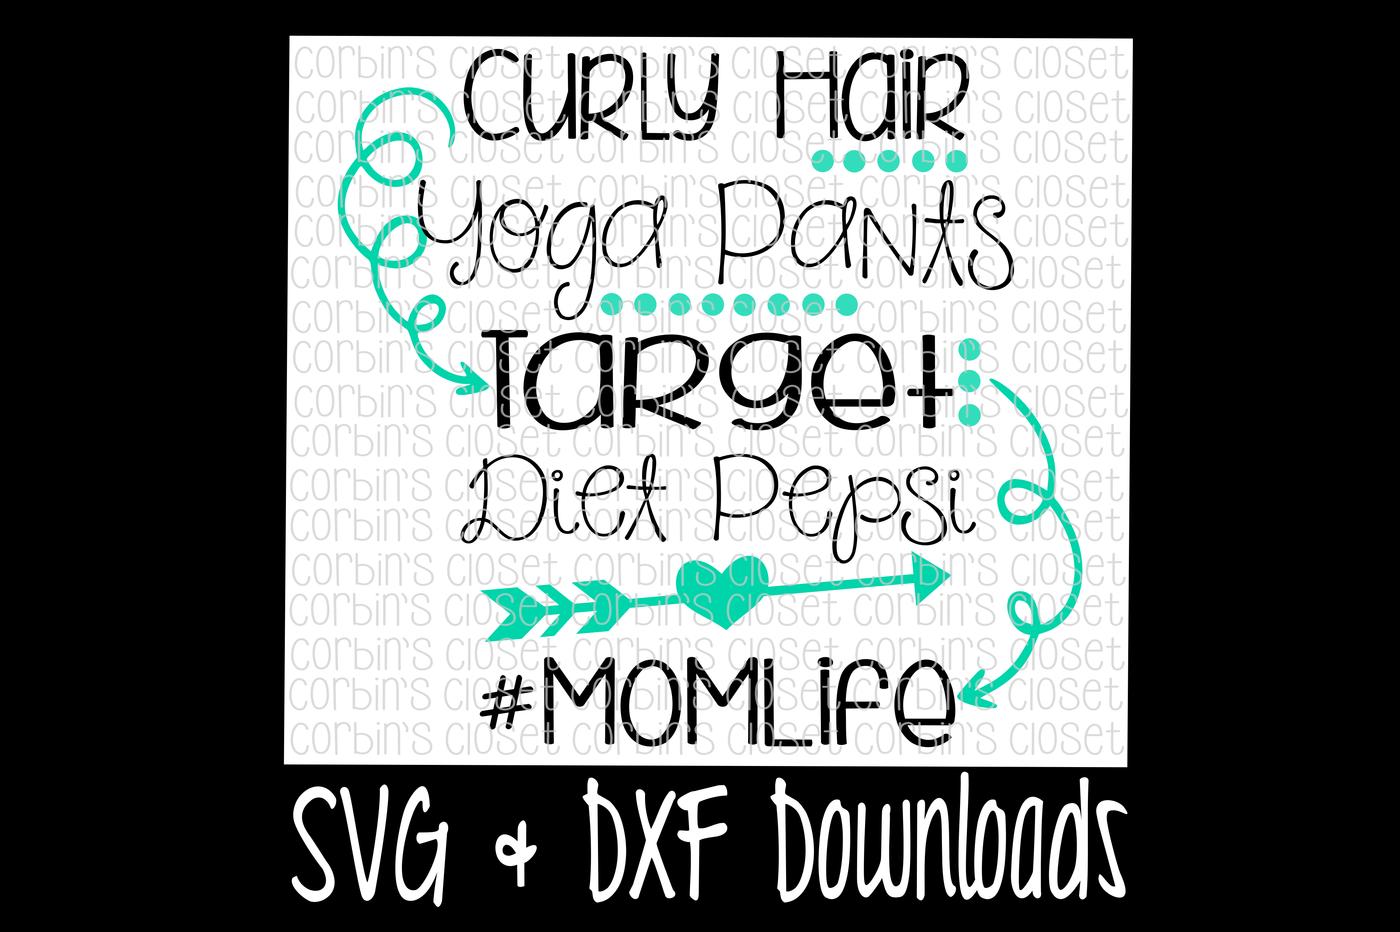 Curly Hair Yoga Pants Target Diet Pepsi Momlife Cutting File By Corbins Svg Thehungryjpeg Com